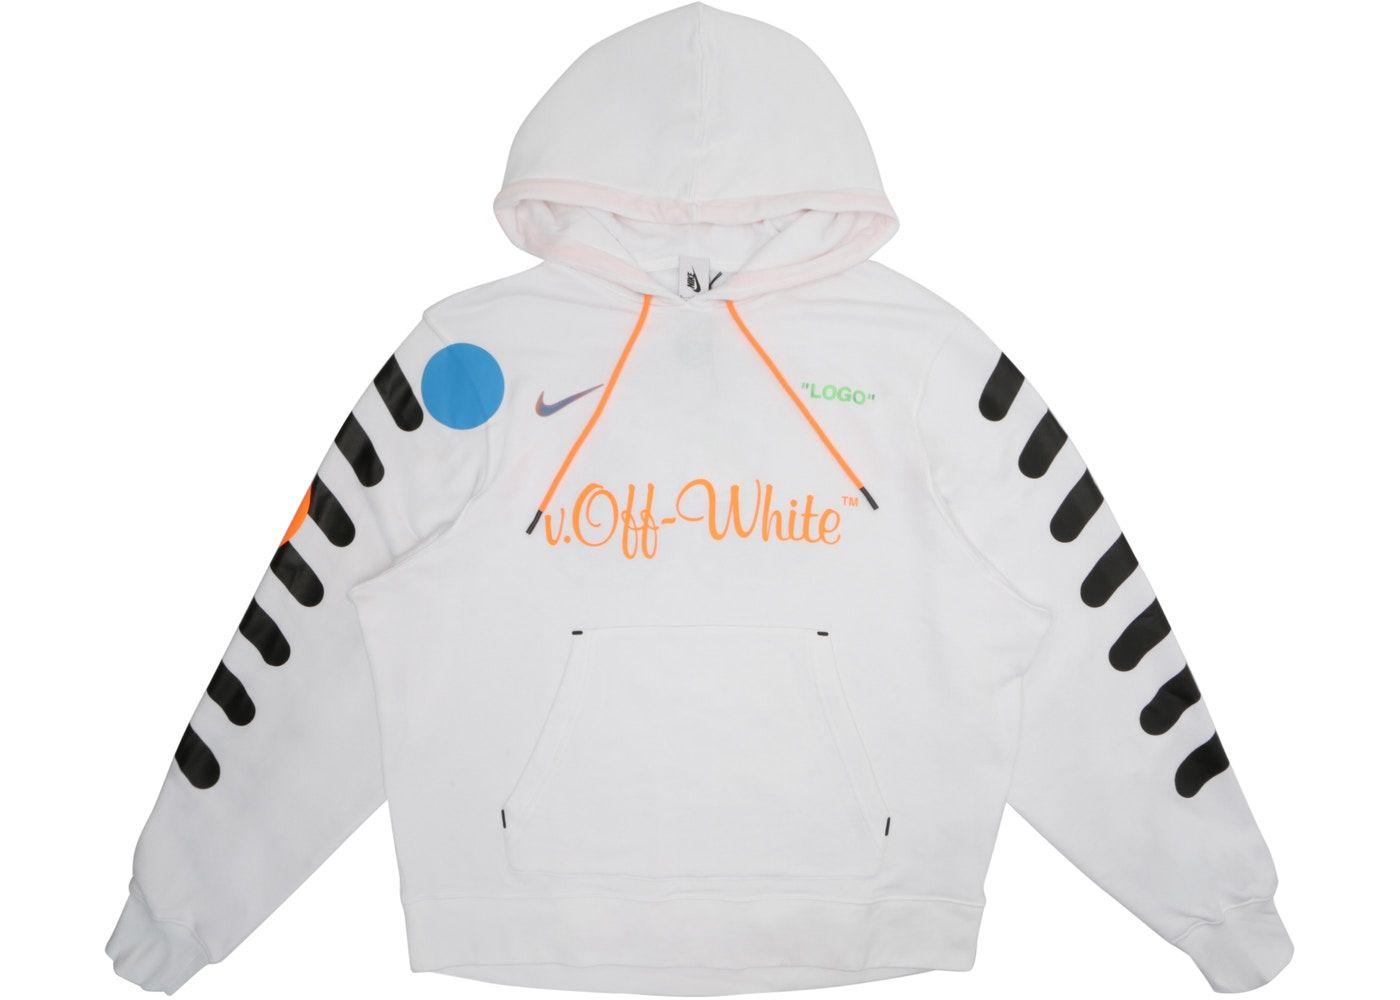 Nikelab X Off White Mercurial Nrg X Hoodie White In 2020 Off White Hoodie White Hoodie Outfit White Hoodie